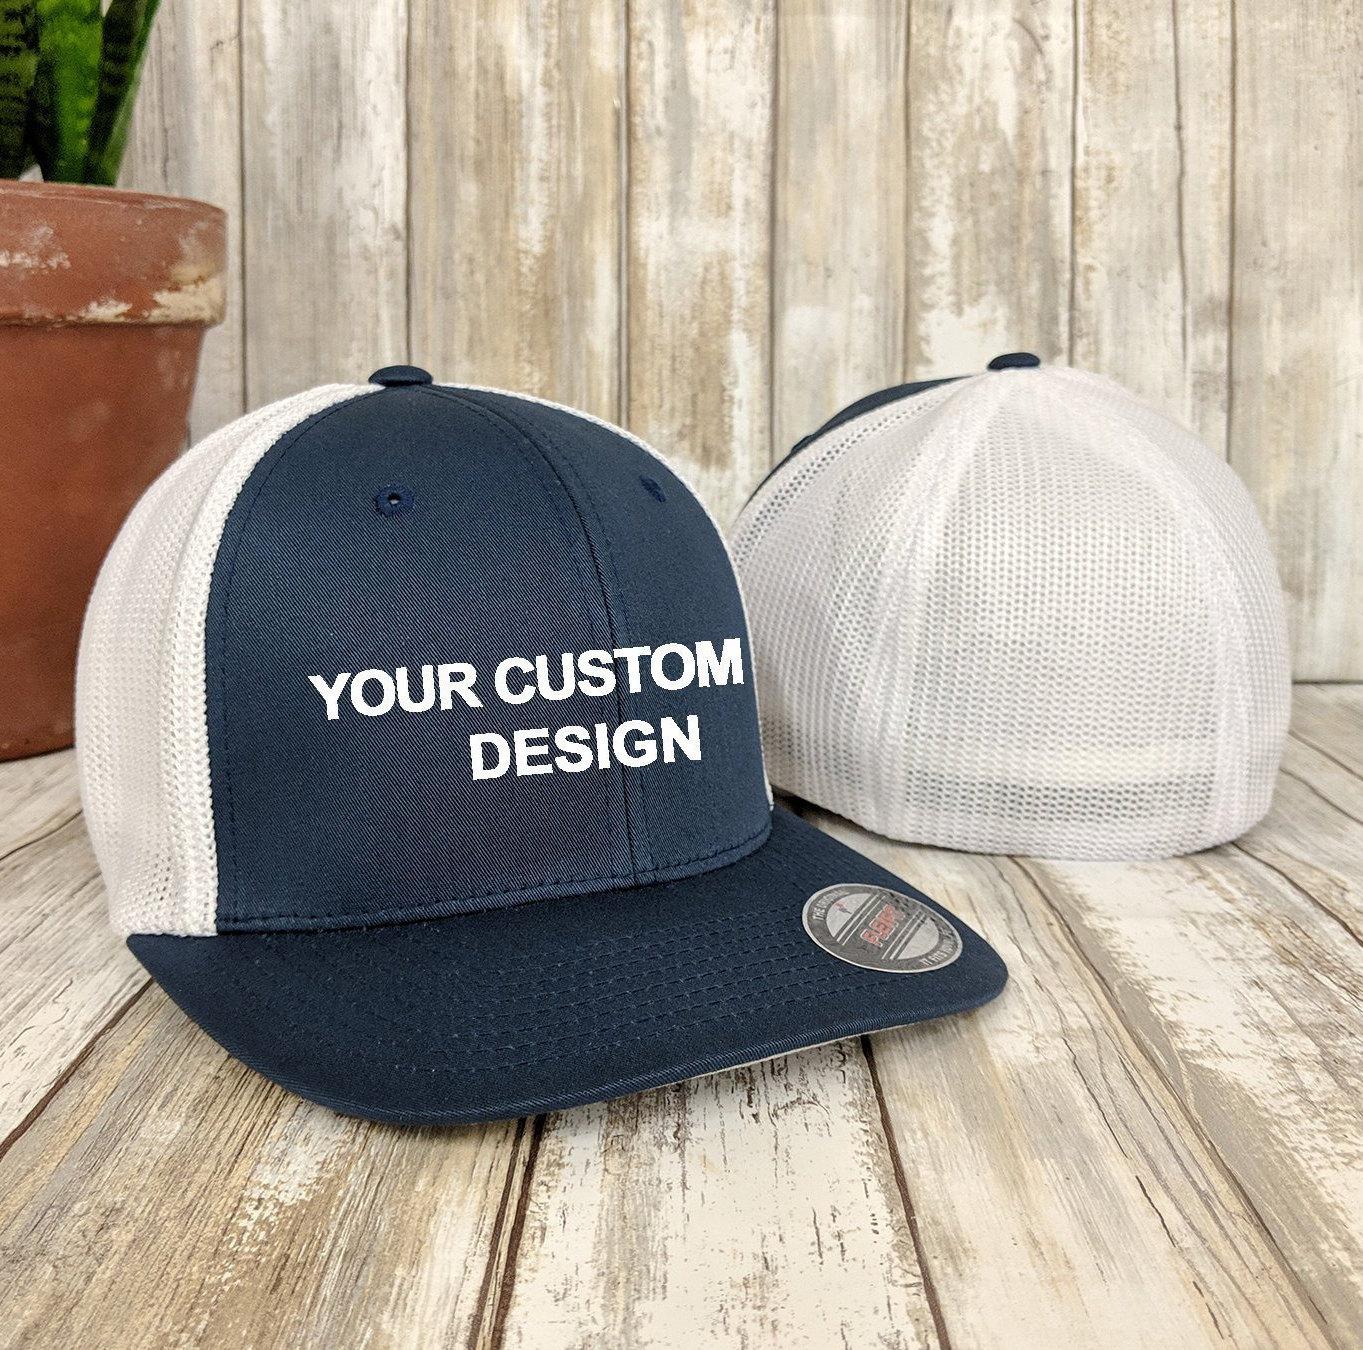 Custom Flexfit Trucker Hat   Flex fit Trucker Cap    4a0ed007a03